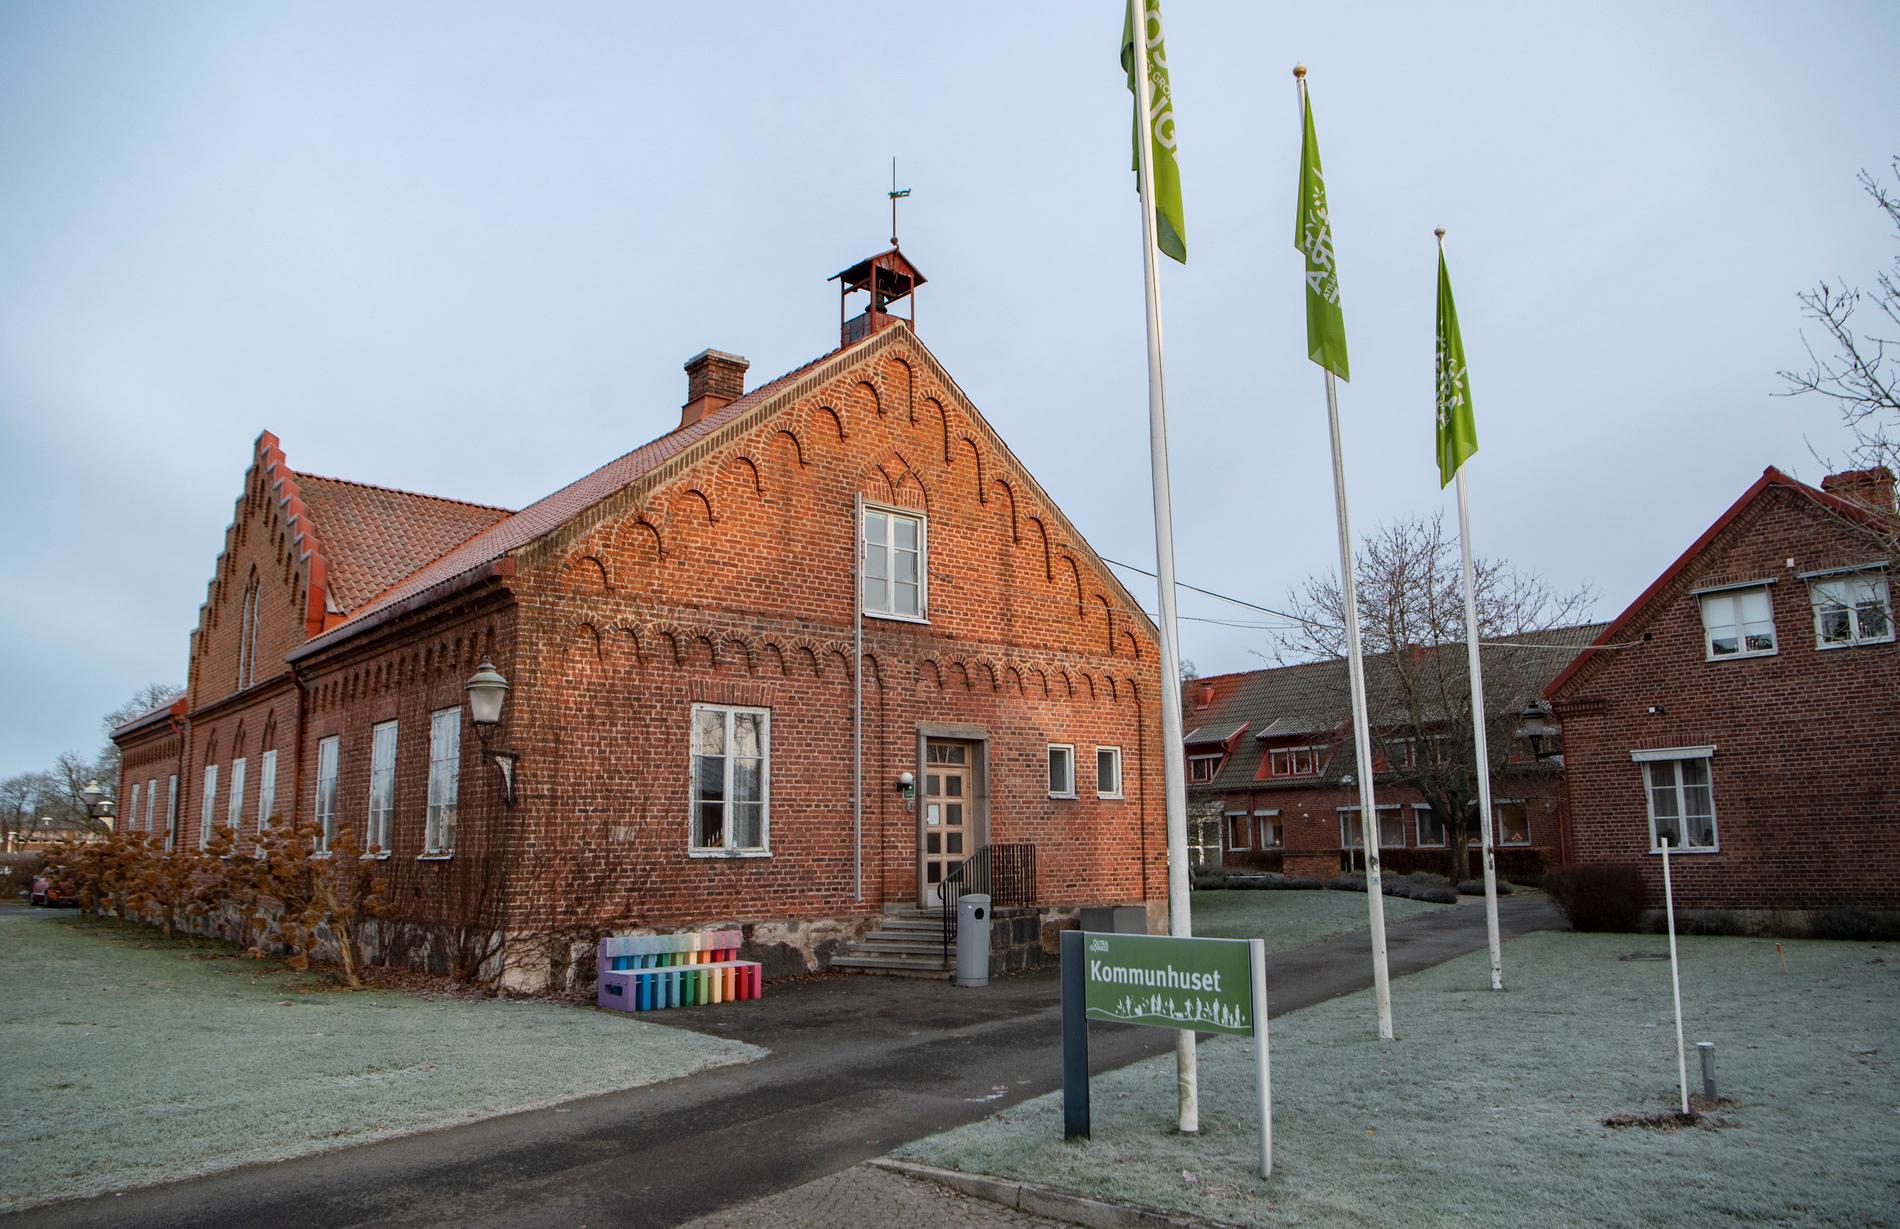 Kommunhuset i Broby - Östra Göinge kommun.